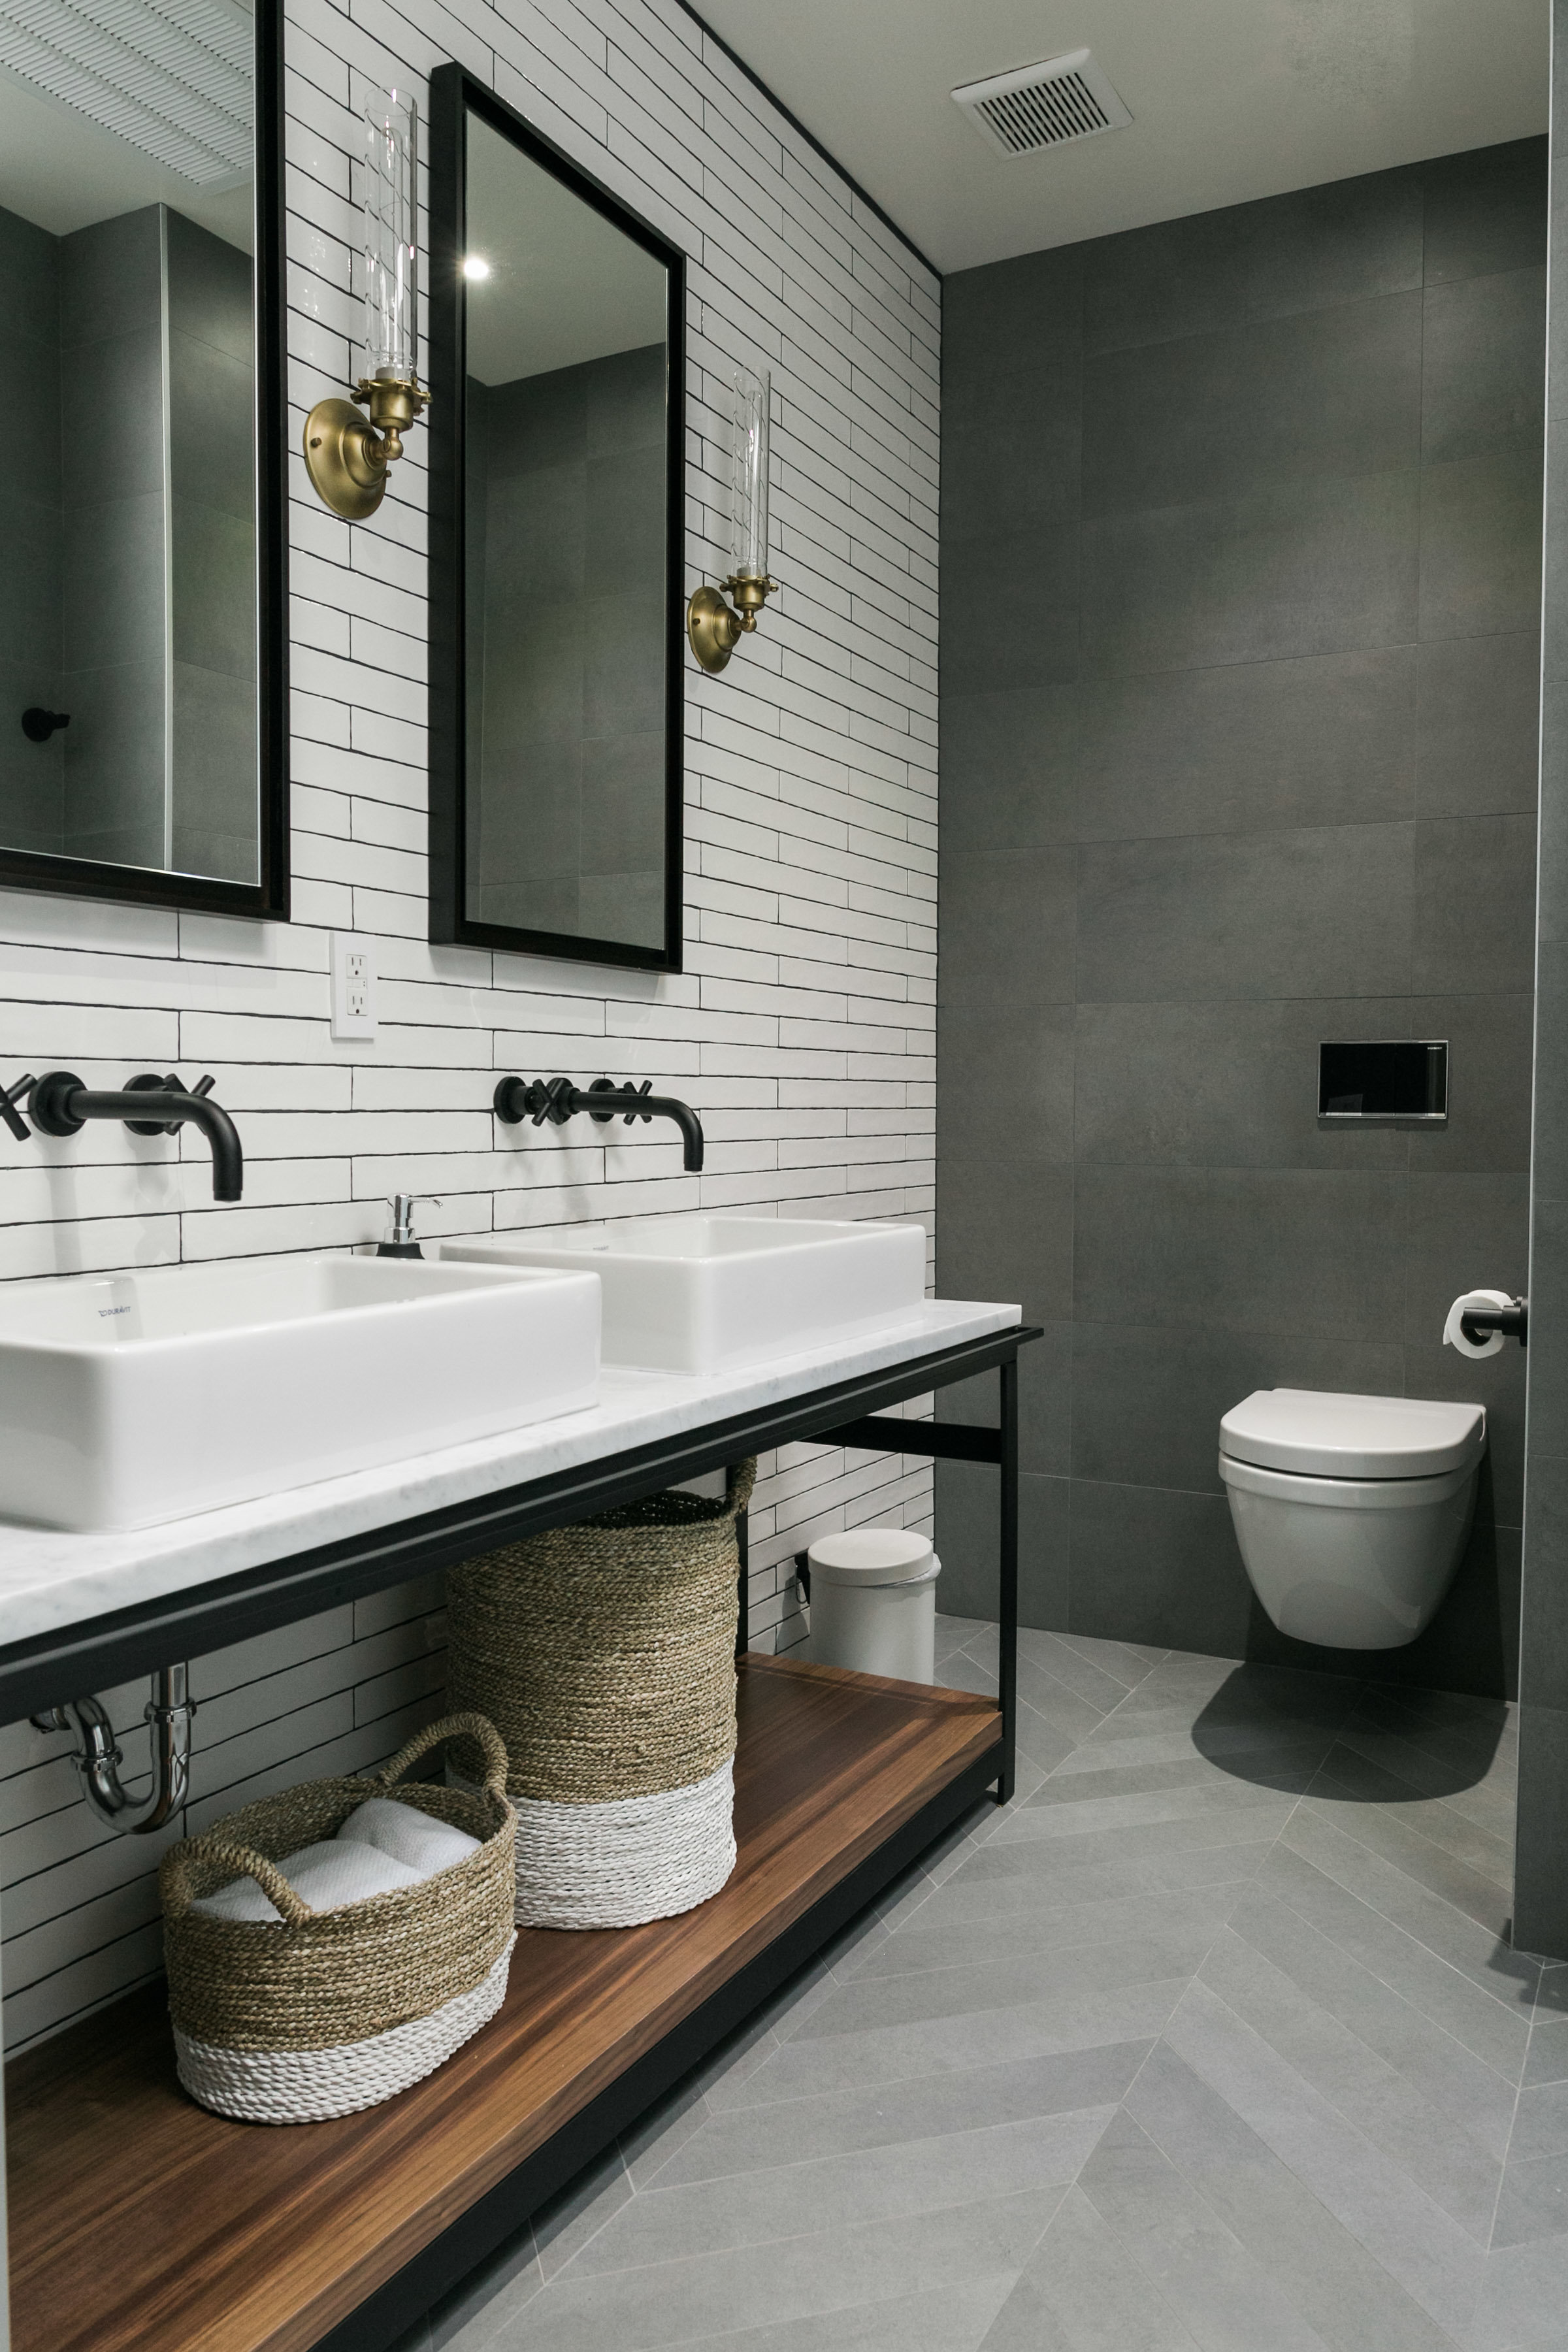 Bathroom_1_001.jpg